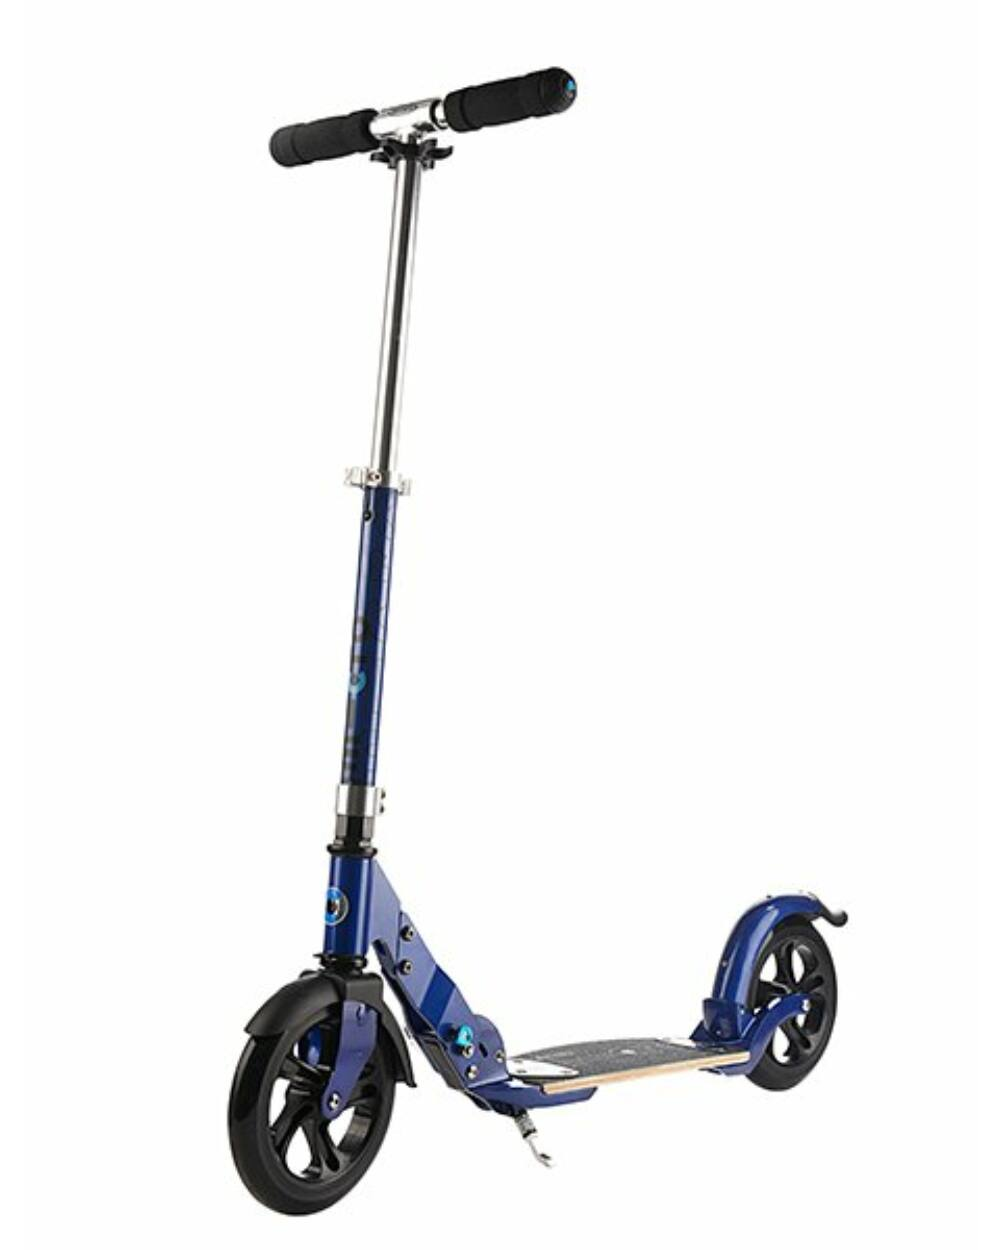 Micro Flex Deluxe városi roller 200mm kerekekkel, kék